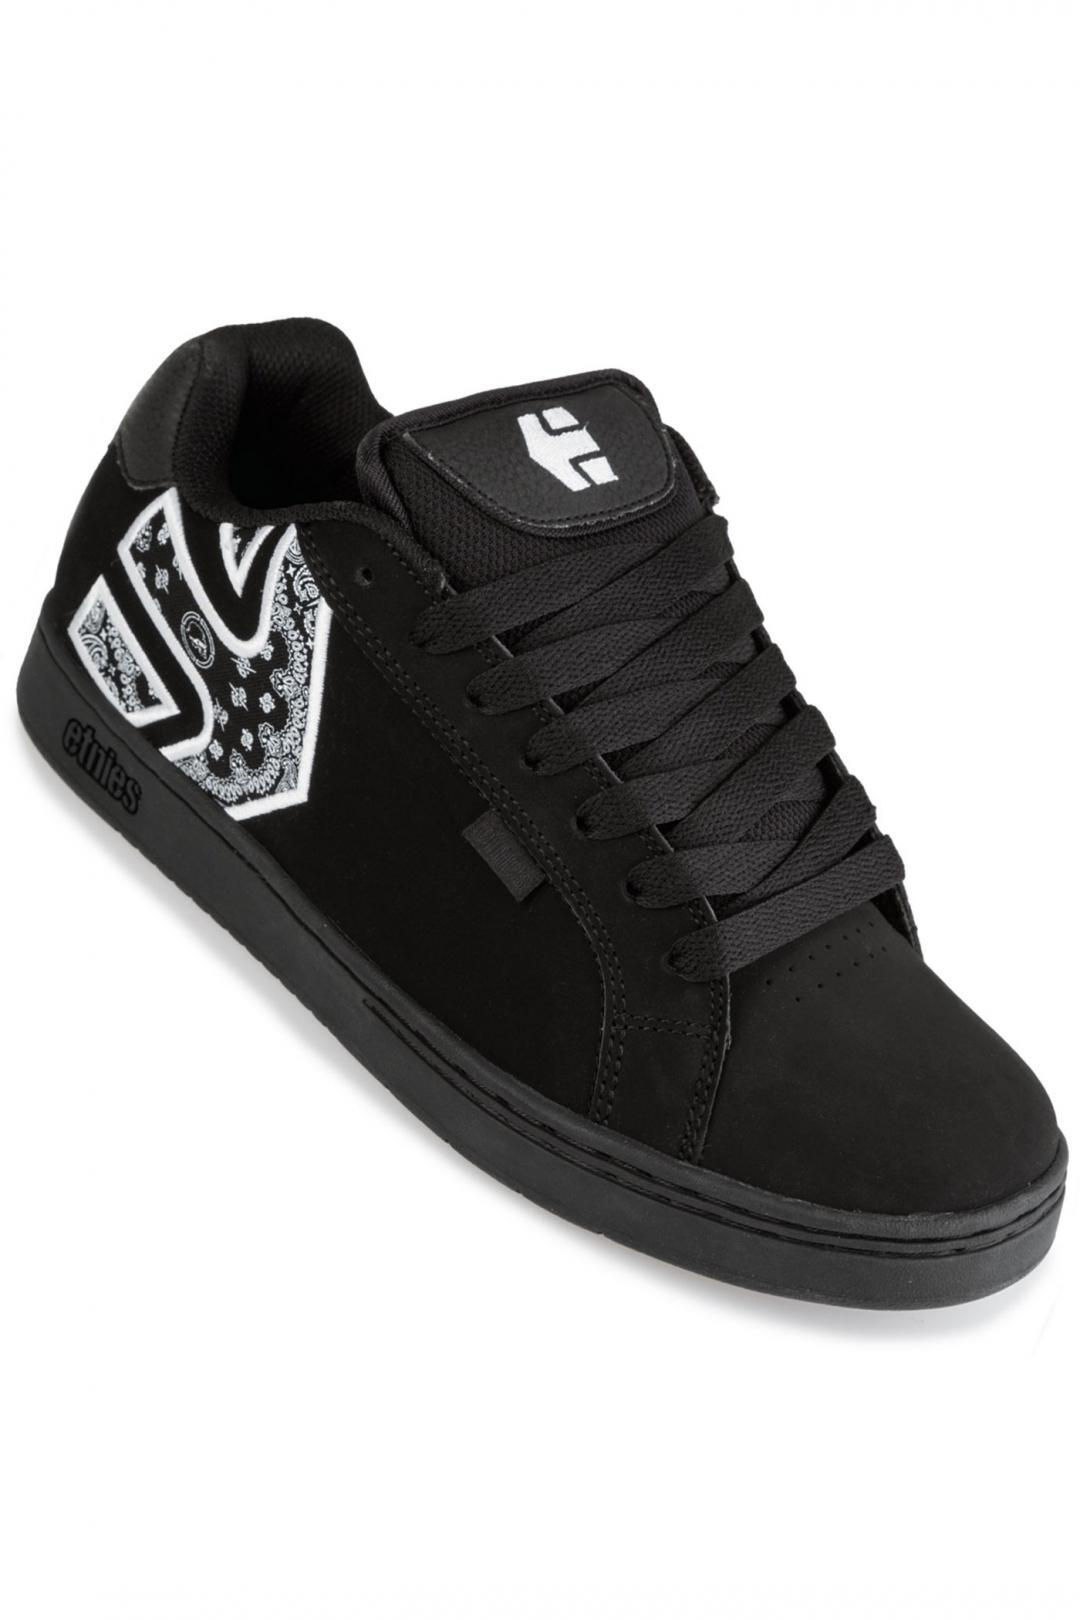 Uomo Etnies Metal Mulisha Fader black white black | Sneakers low top